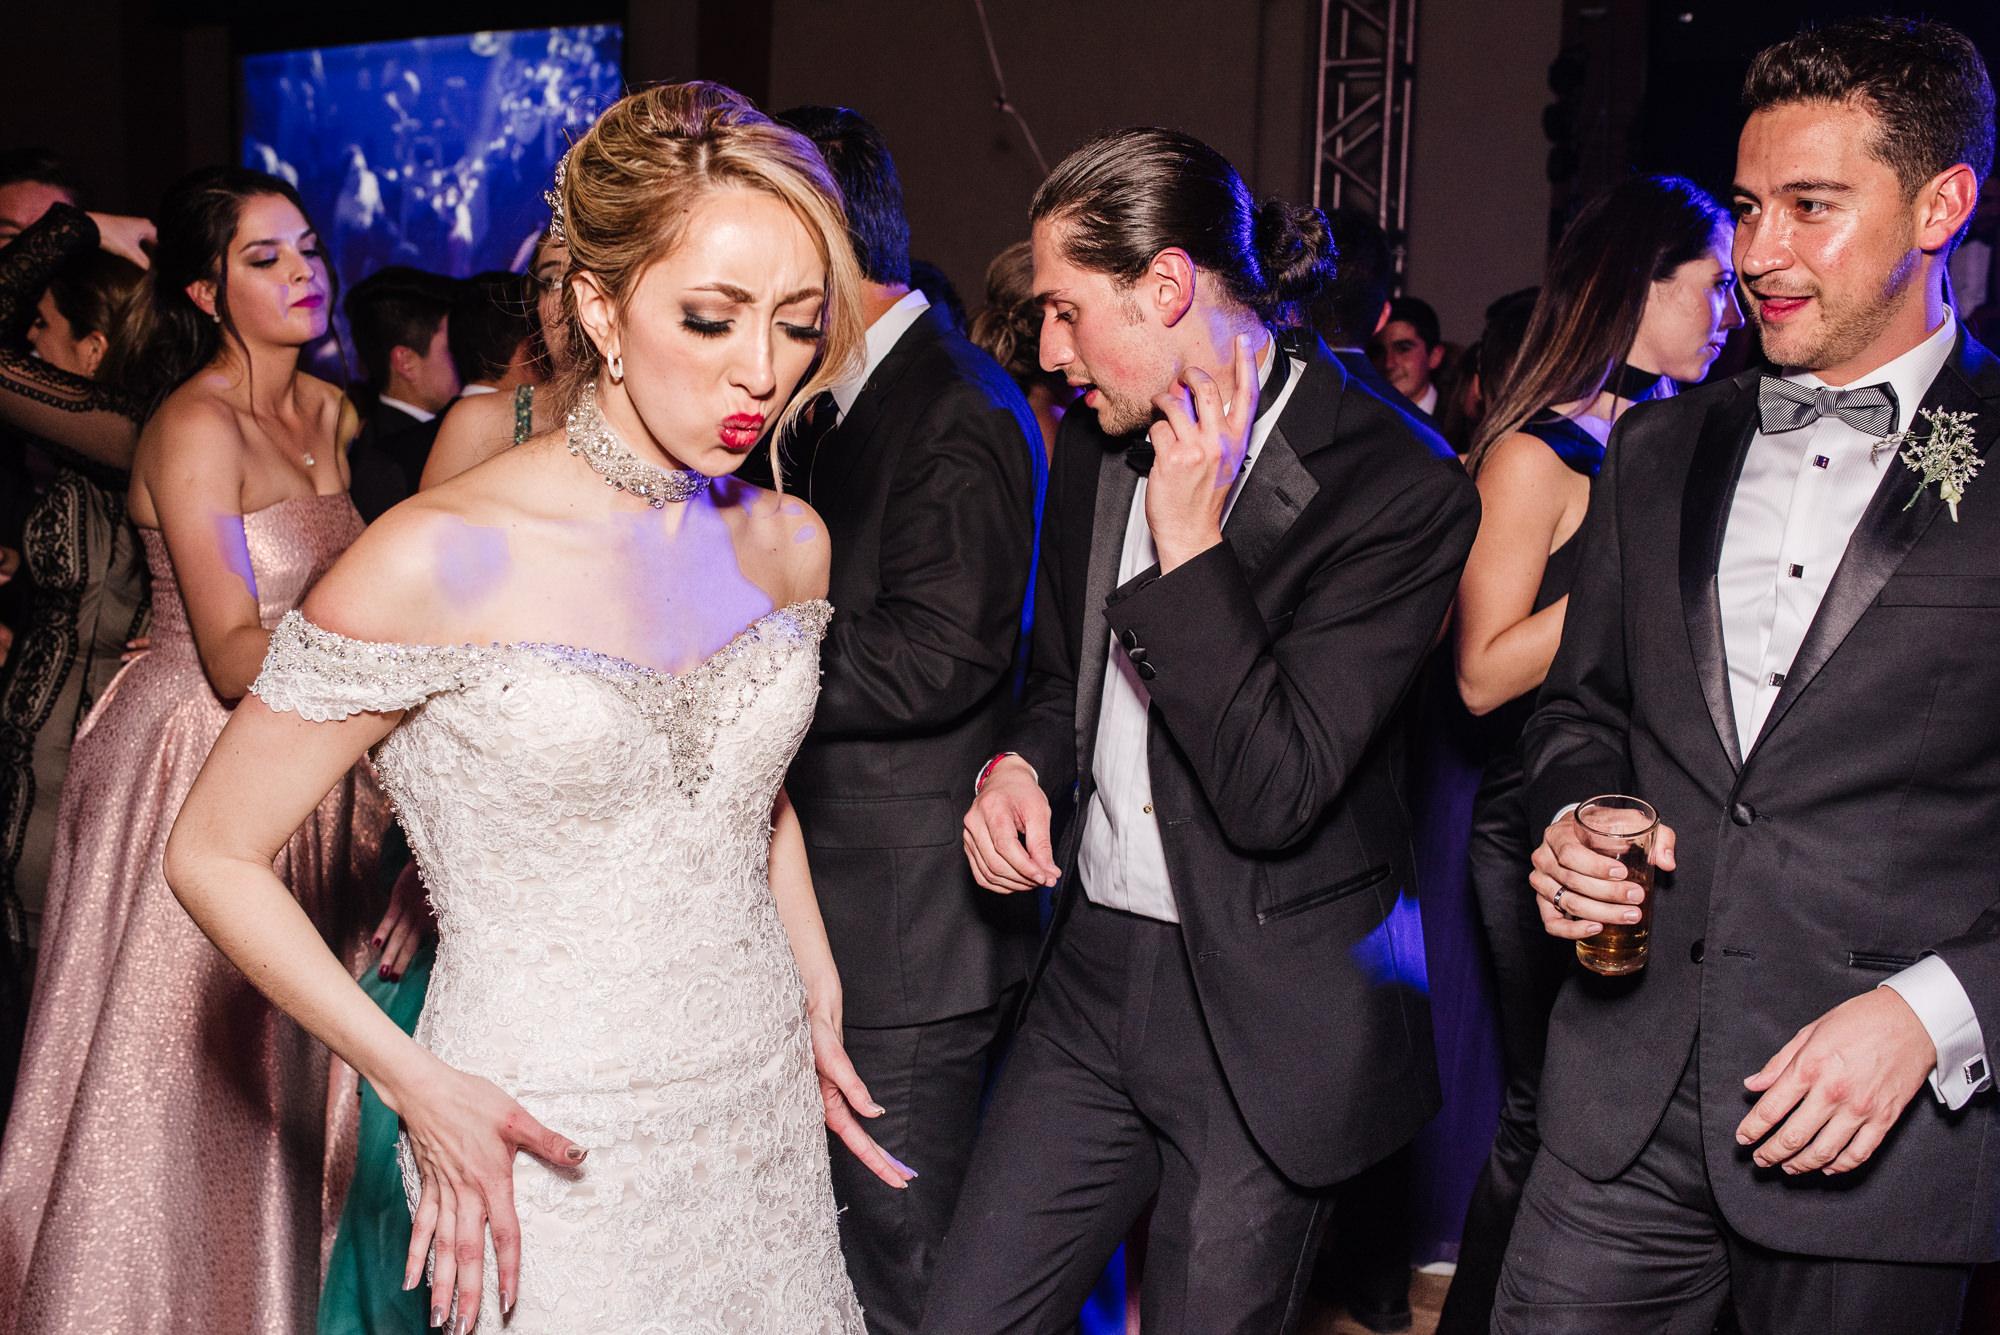 Mario-Karla-Wedding-321